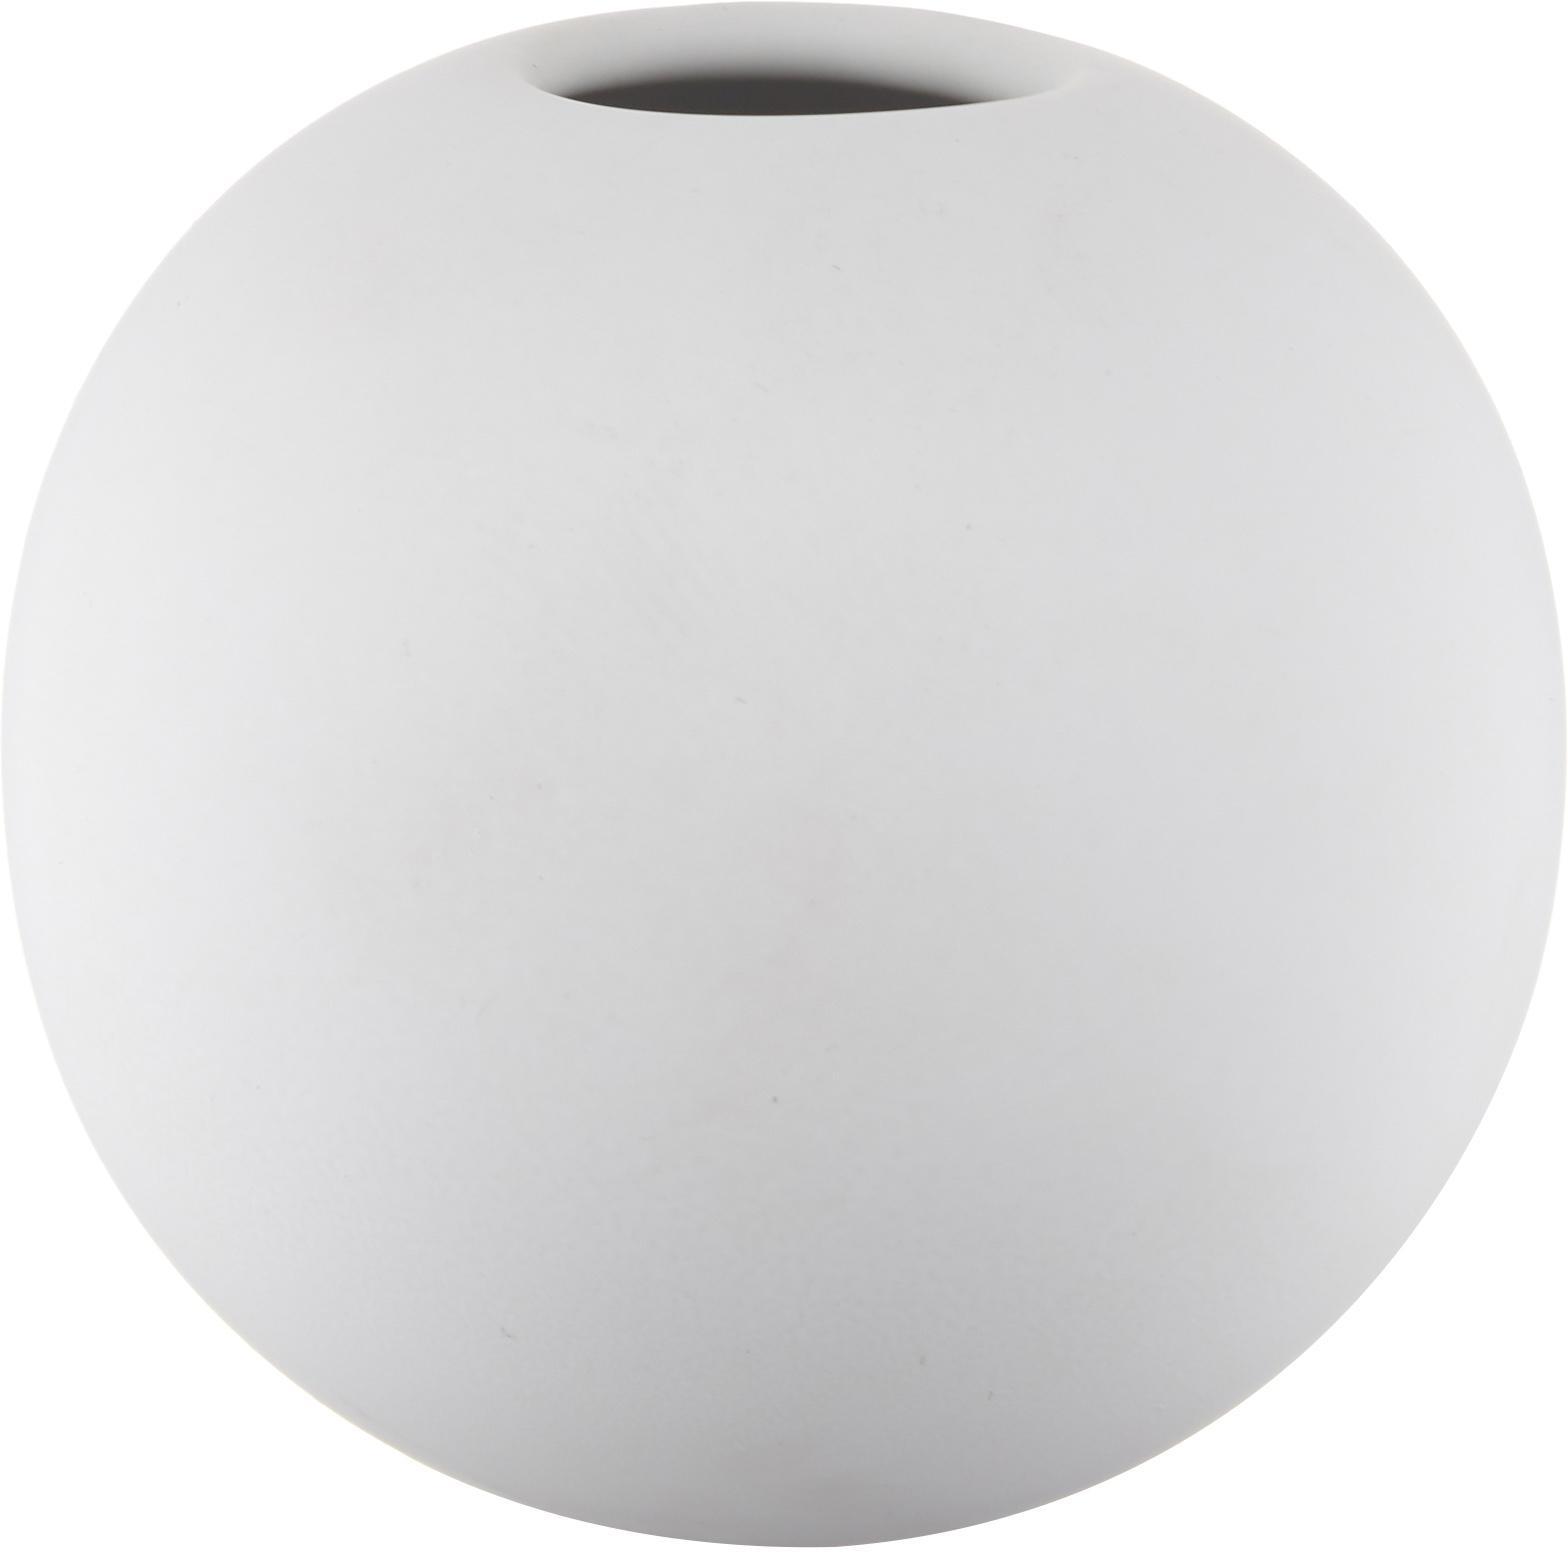 Vaso a sfera fatto a mano Ball, Ceramica, Bianco, Ø 8 x Alt. 8 cm